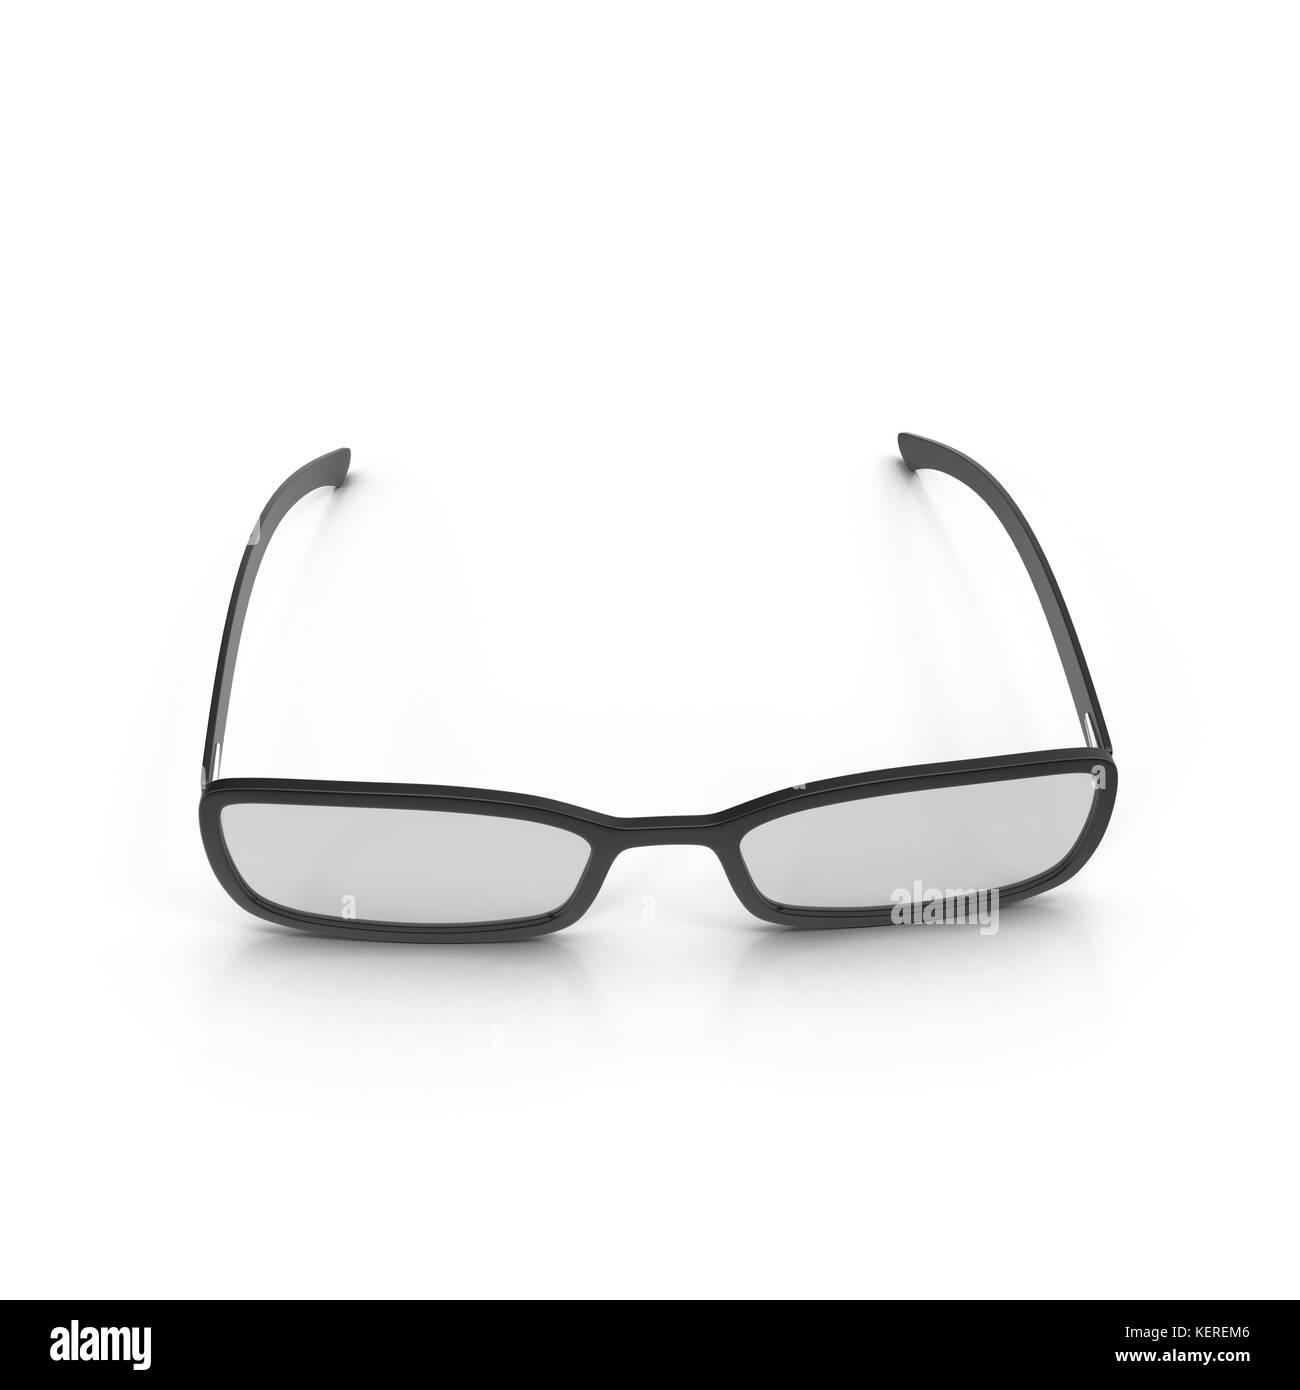 Eye Illustration 3d Stockfotos & Eye Illustration 3d Bilder - Alamy